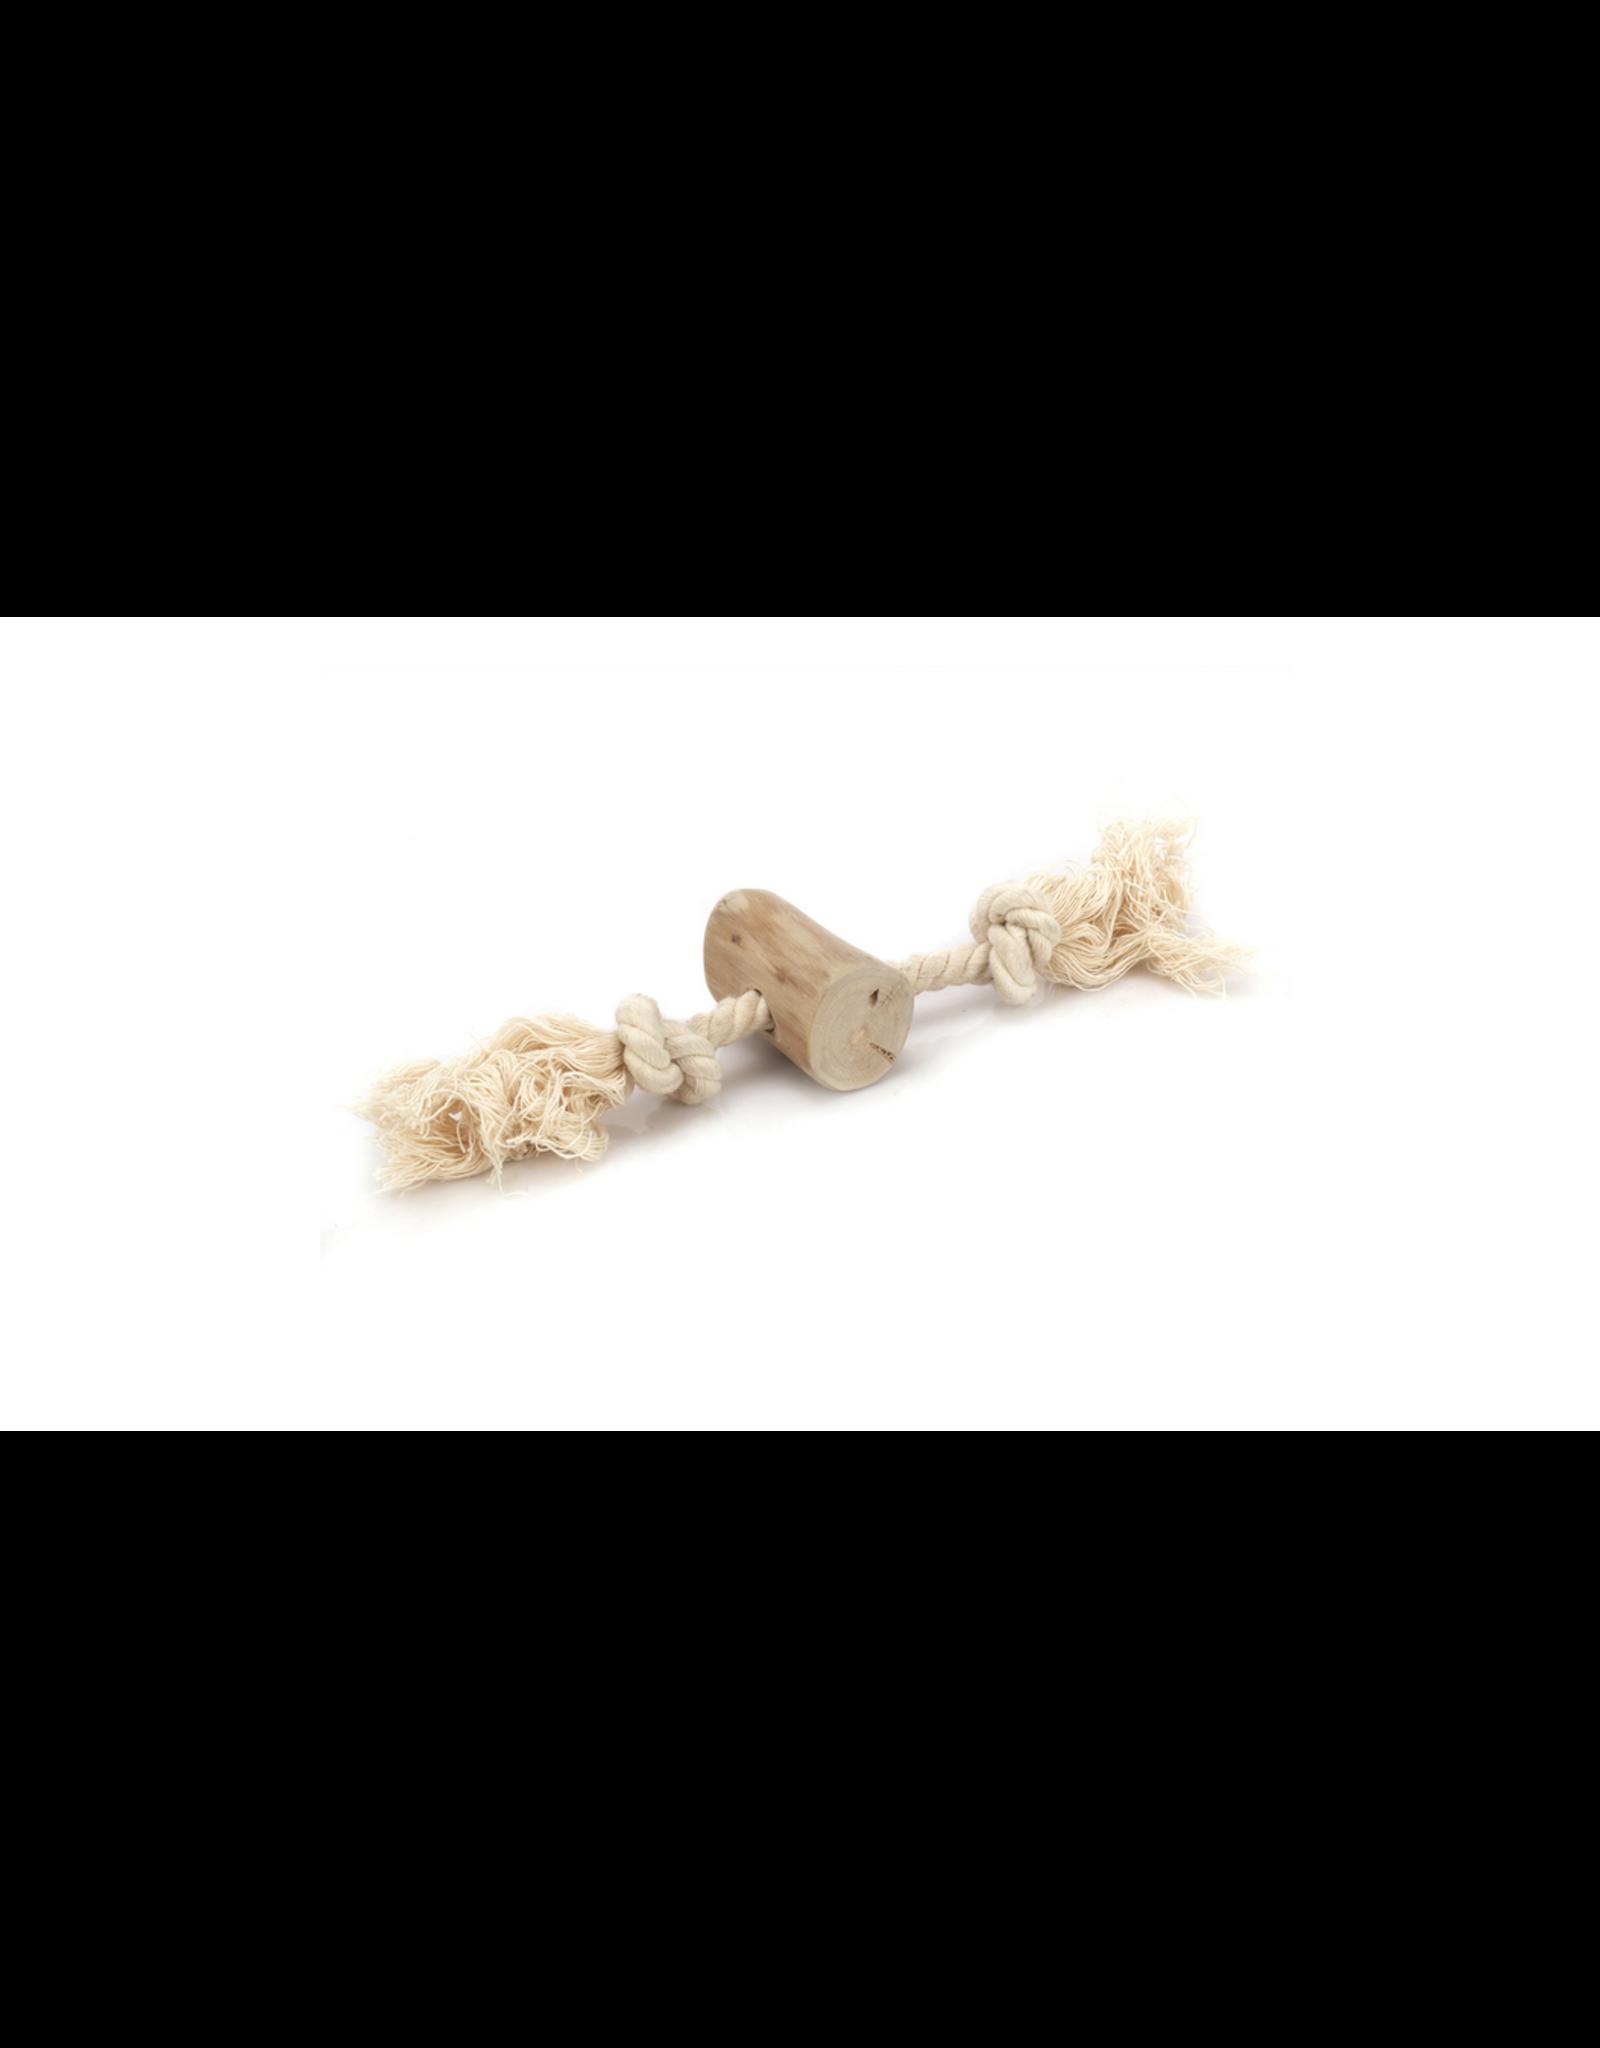 Gorilla Chew Gorilla Chew - Cotton Rope - Medium